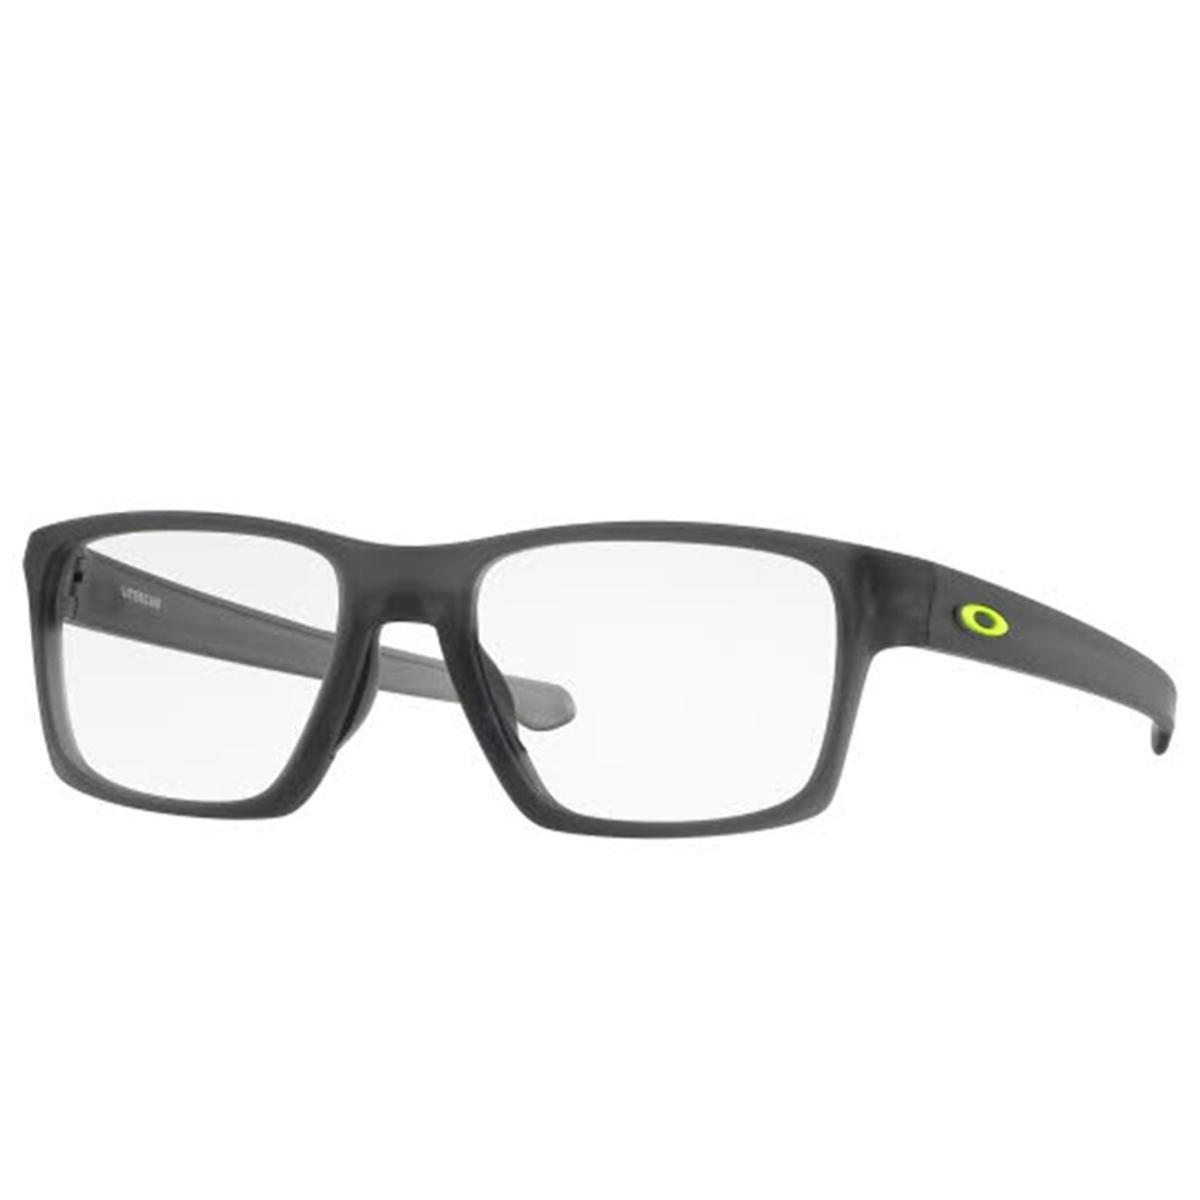 ff5c905781868 Óculos Oakley de Grau Lightbeam - - Cinza - Compre Agora